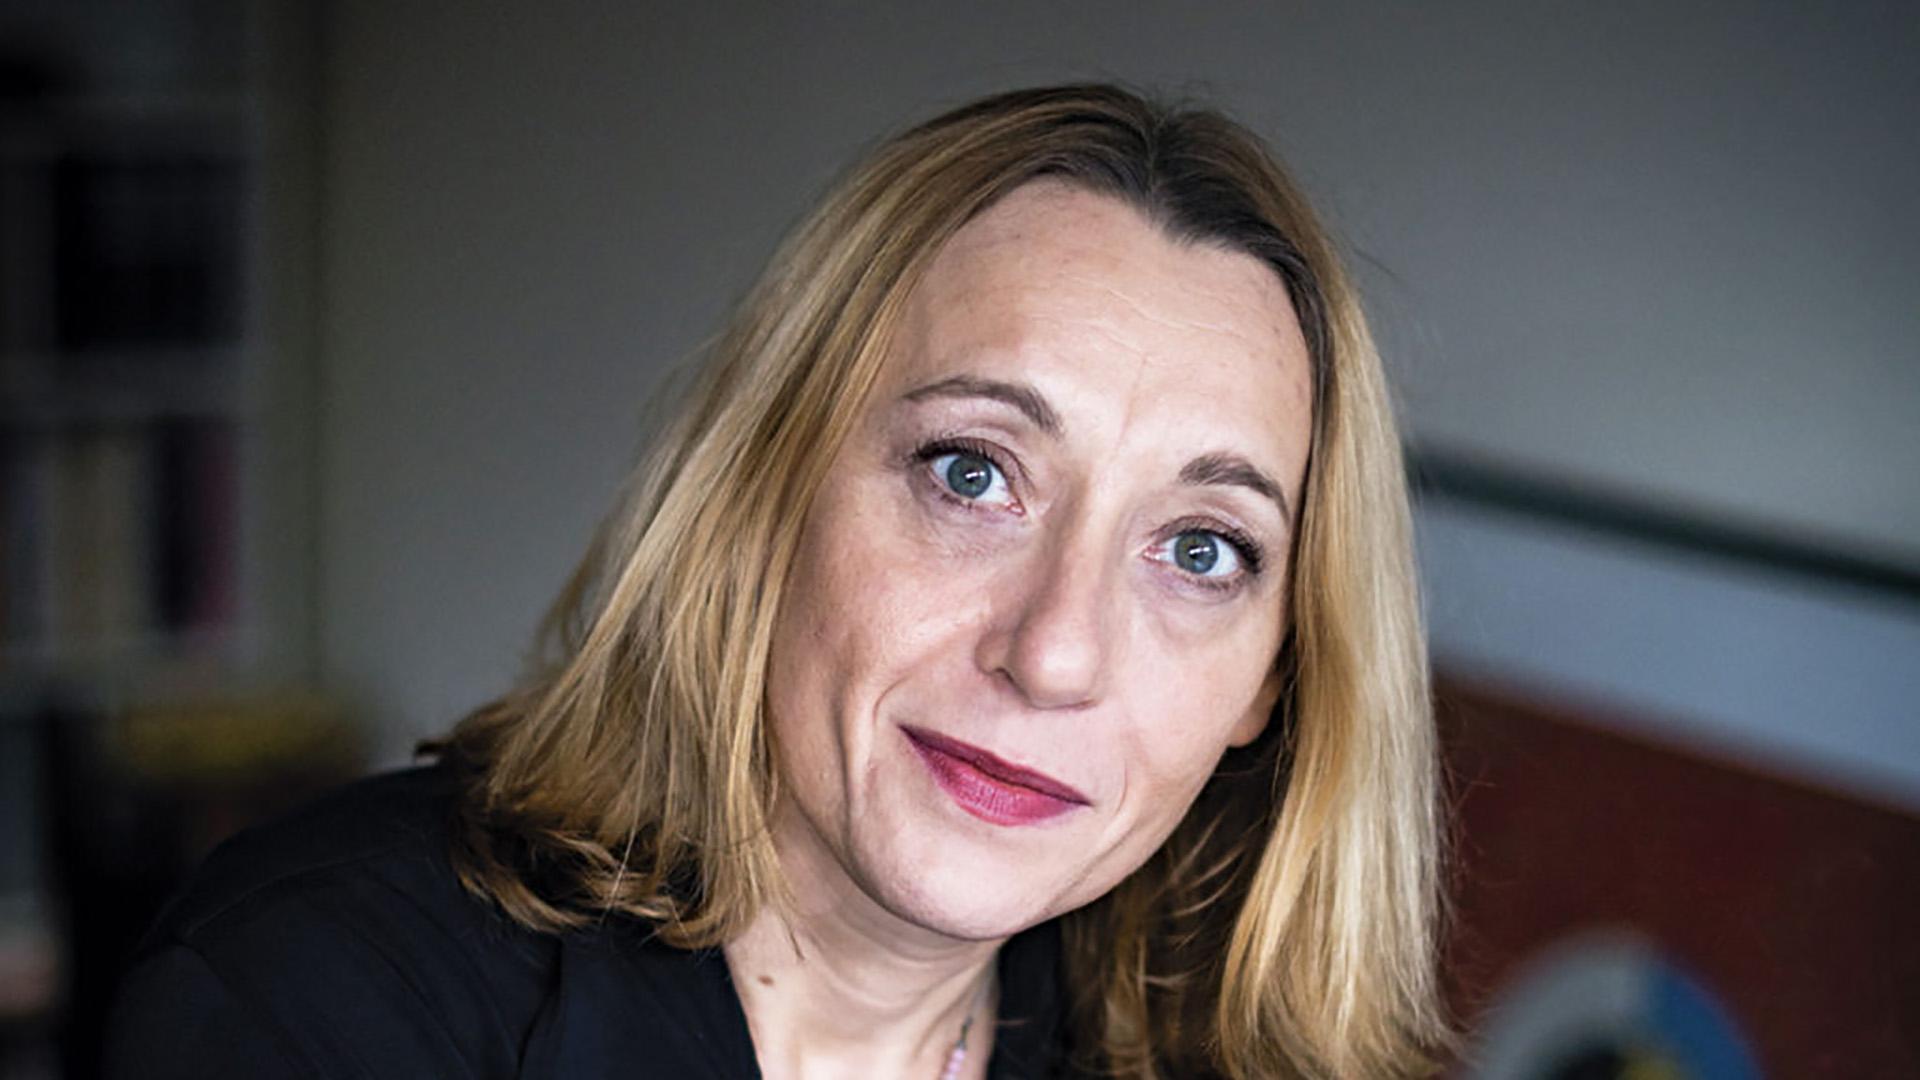 Quién es Virginie Despentes, la escritora feminista que revoluciona Francia  - Infobae